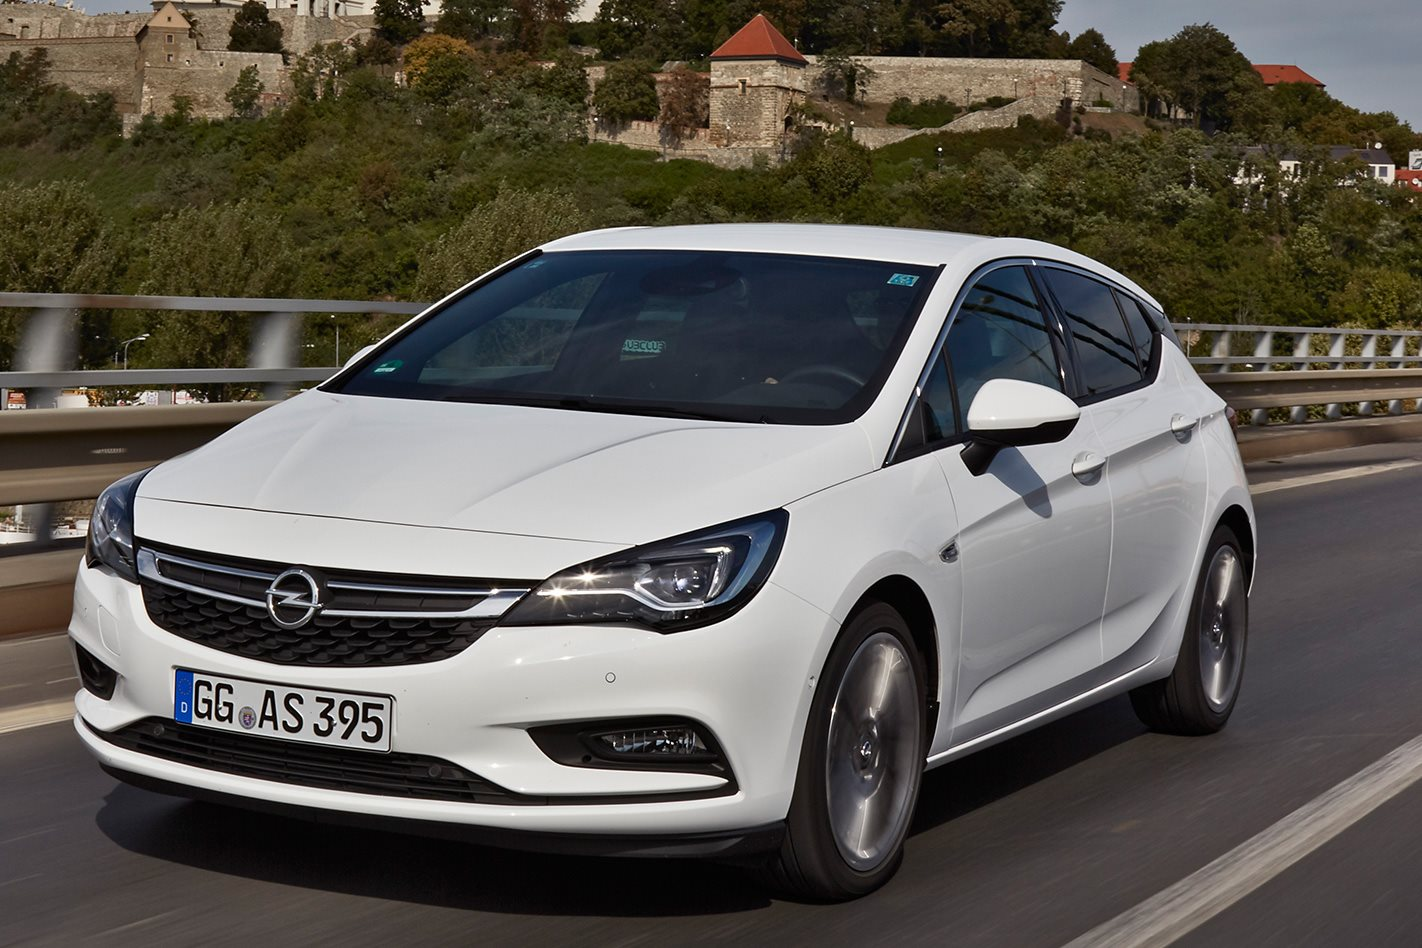 najviac poruchové auto, Diesel Vauxhall Astra, biele auto, porucha vozidla